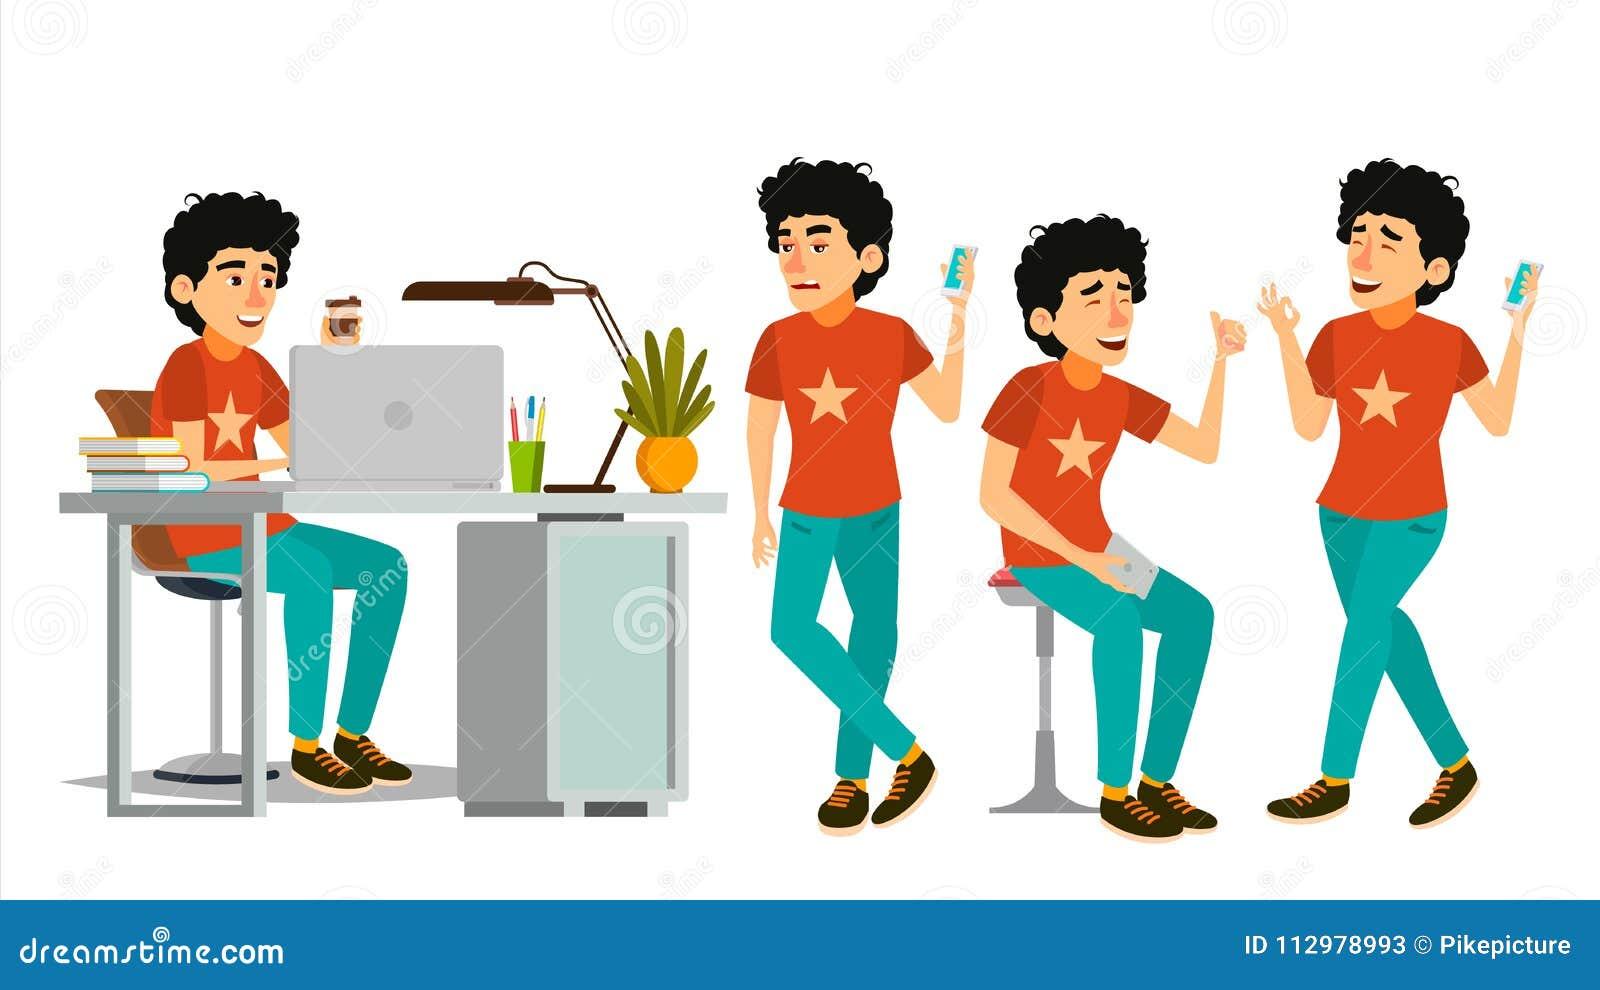 Junior Developer Character Vector. Young Coder In Modern Office Workplace. Developer. Programmer. Software. Environment